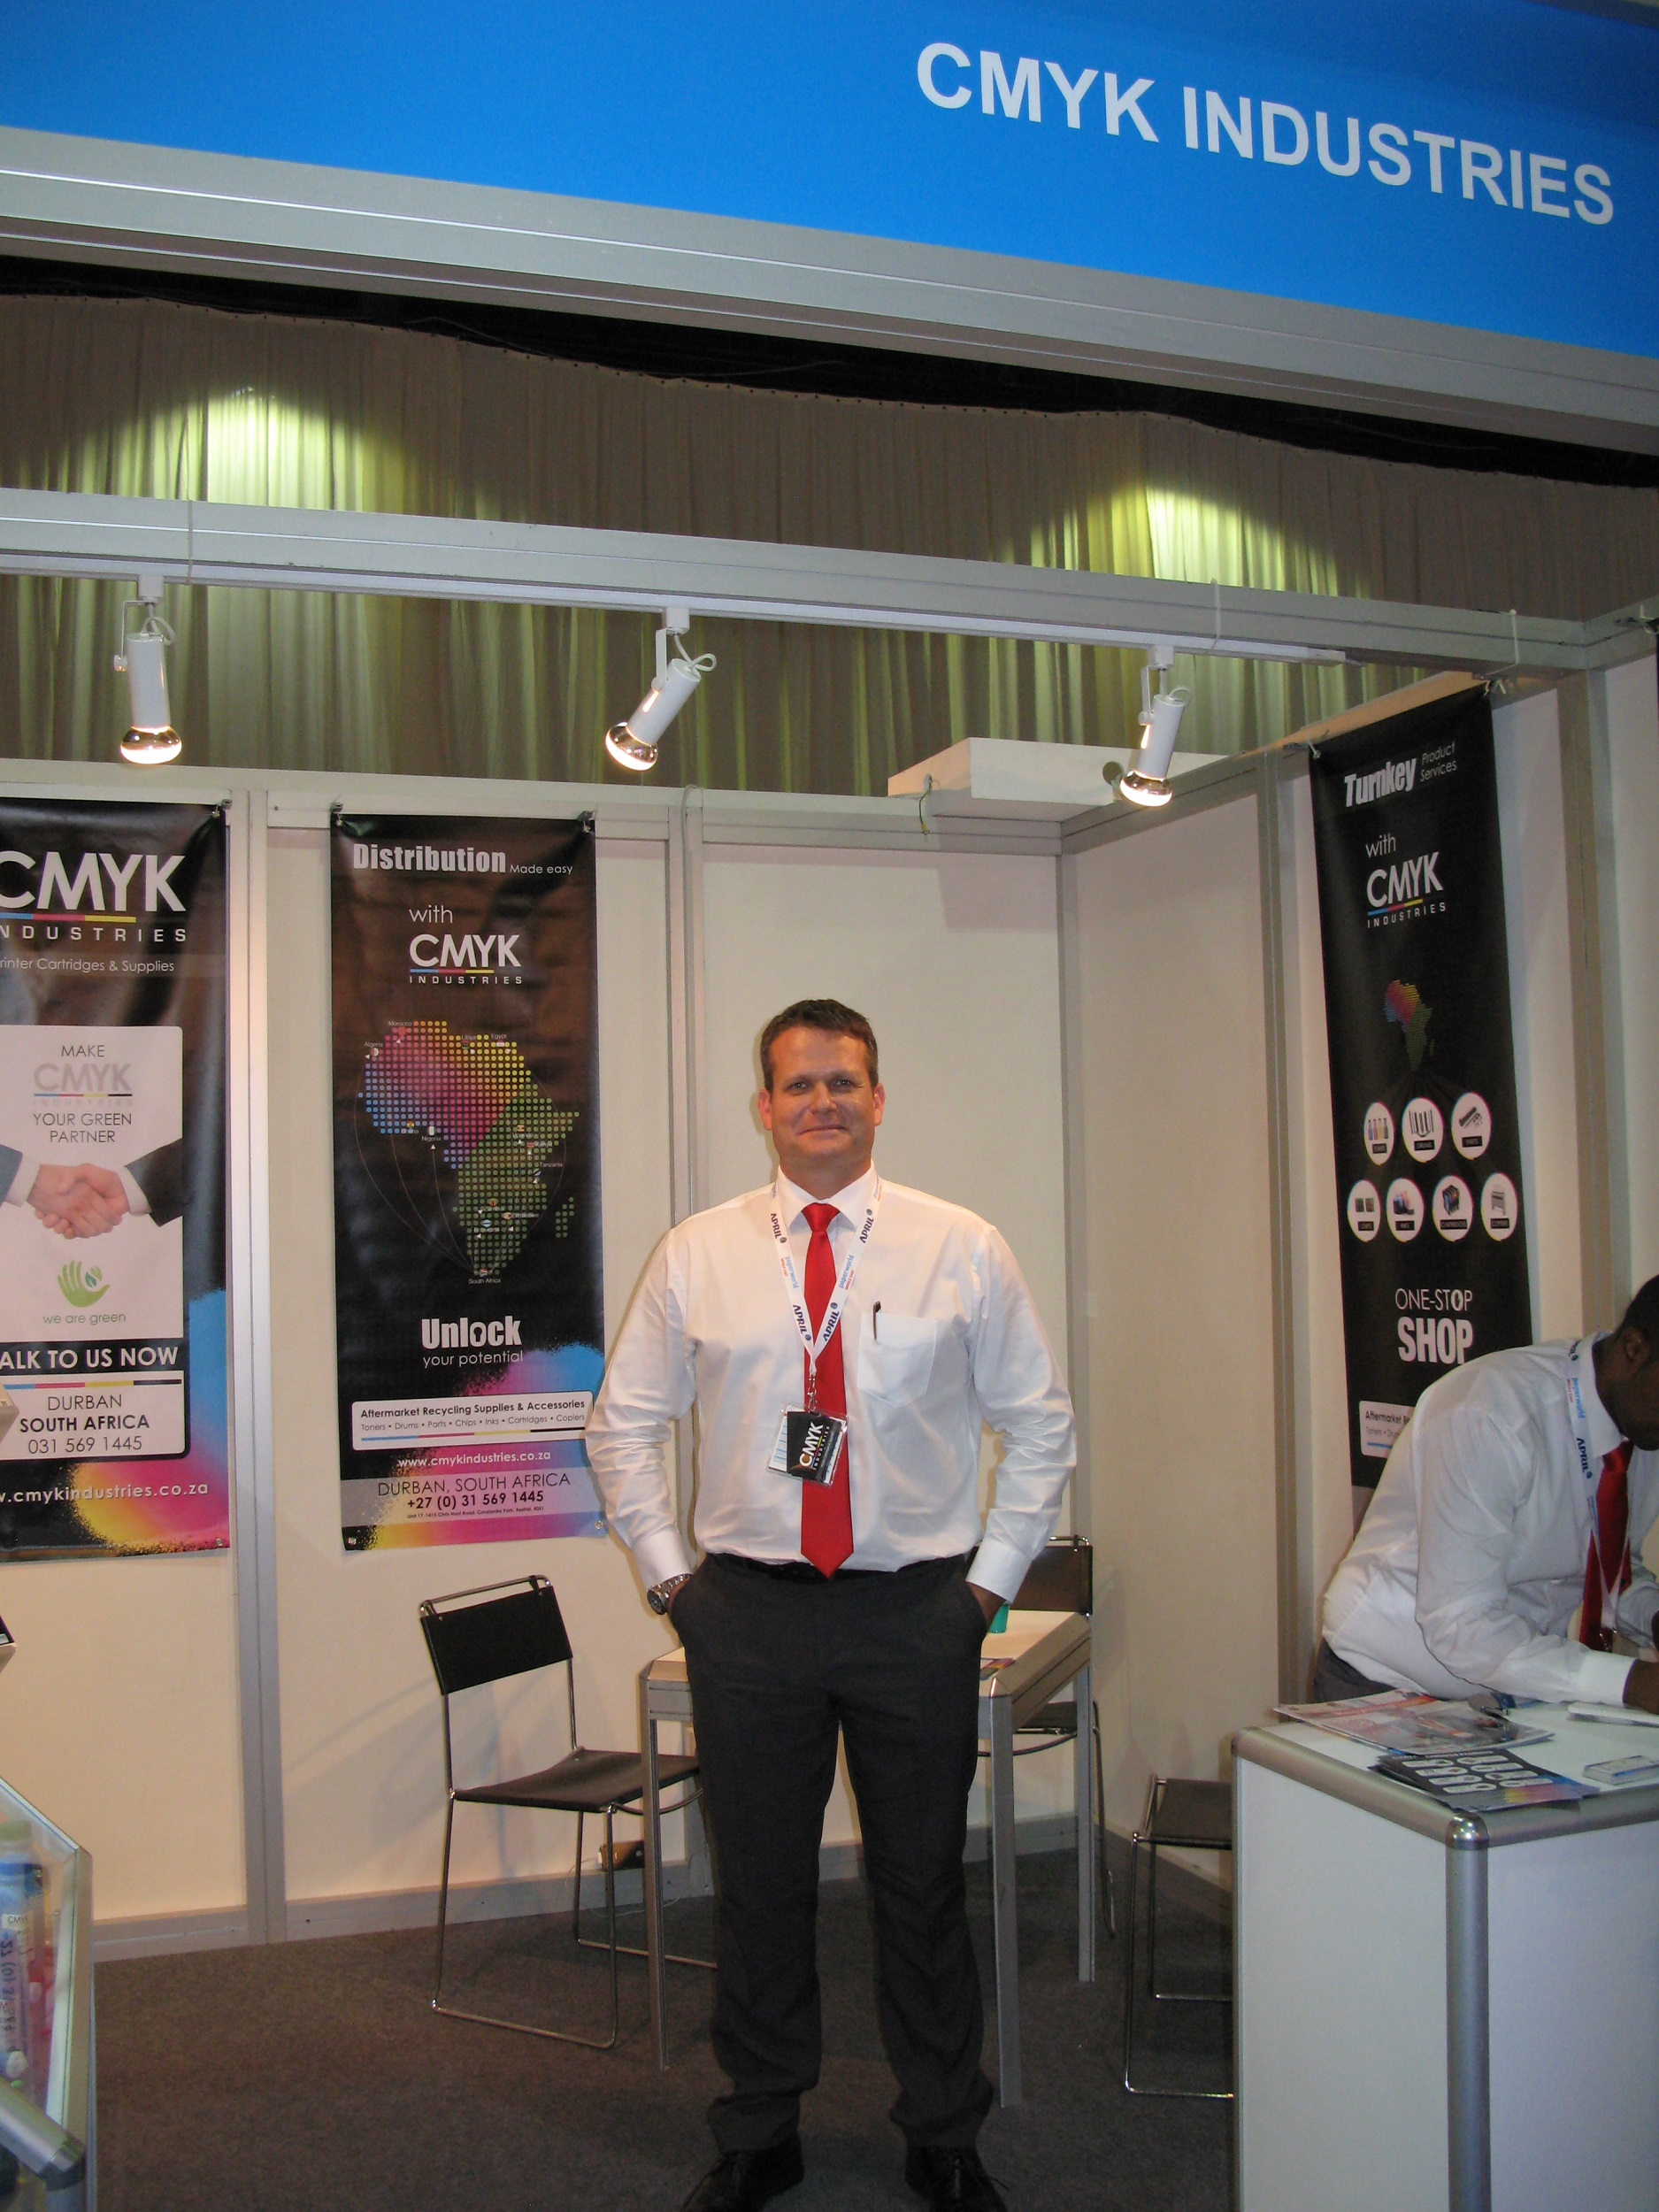 Uninet appoints CMYK Industries as distribution partner